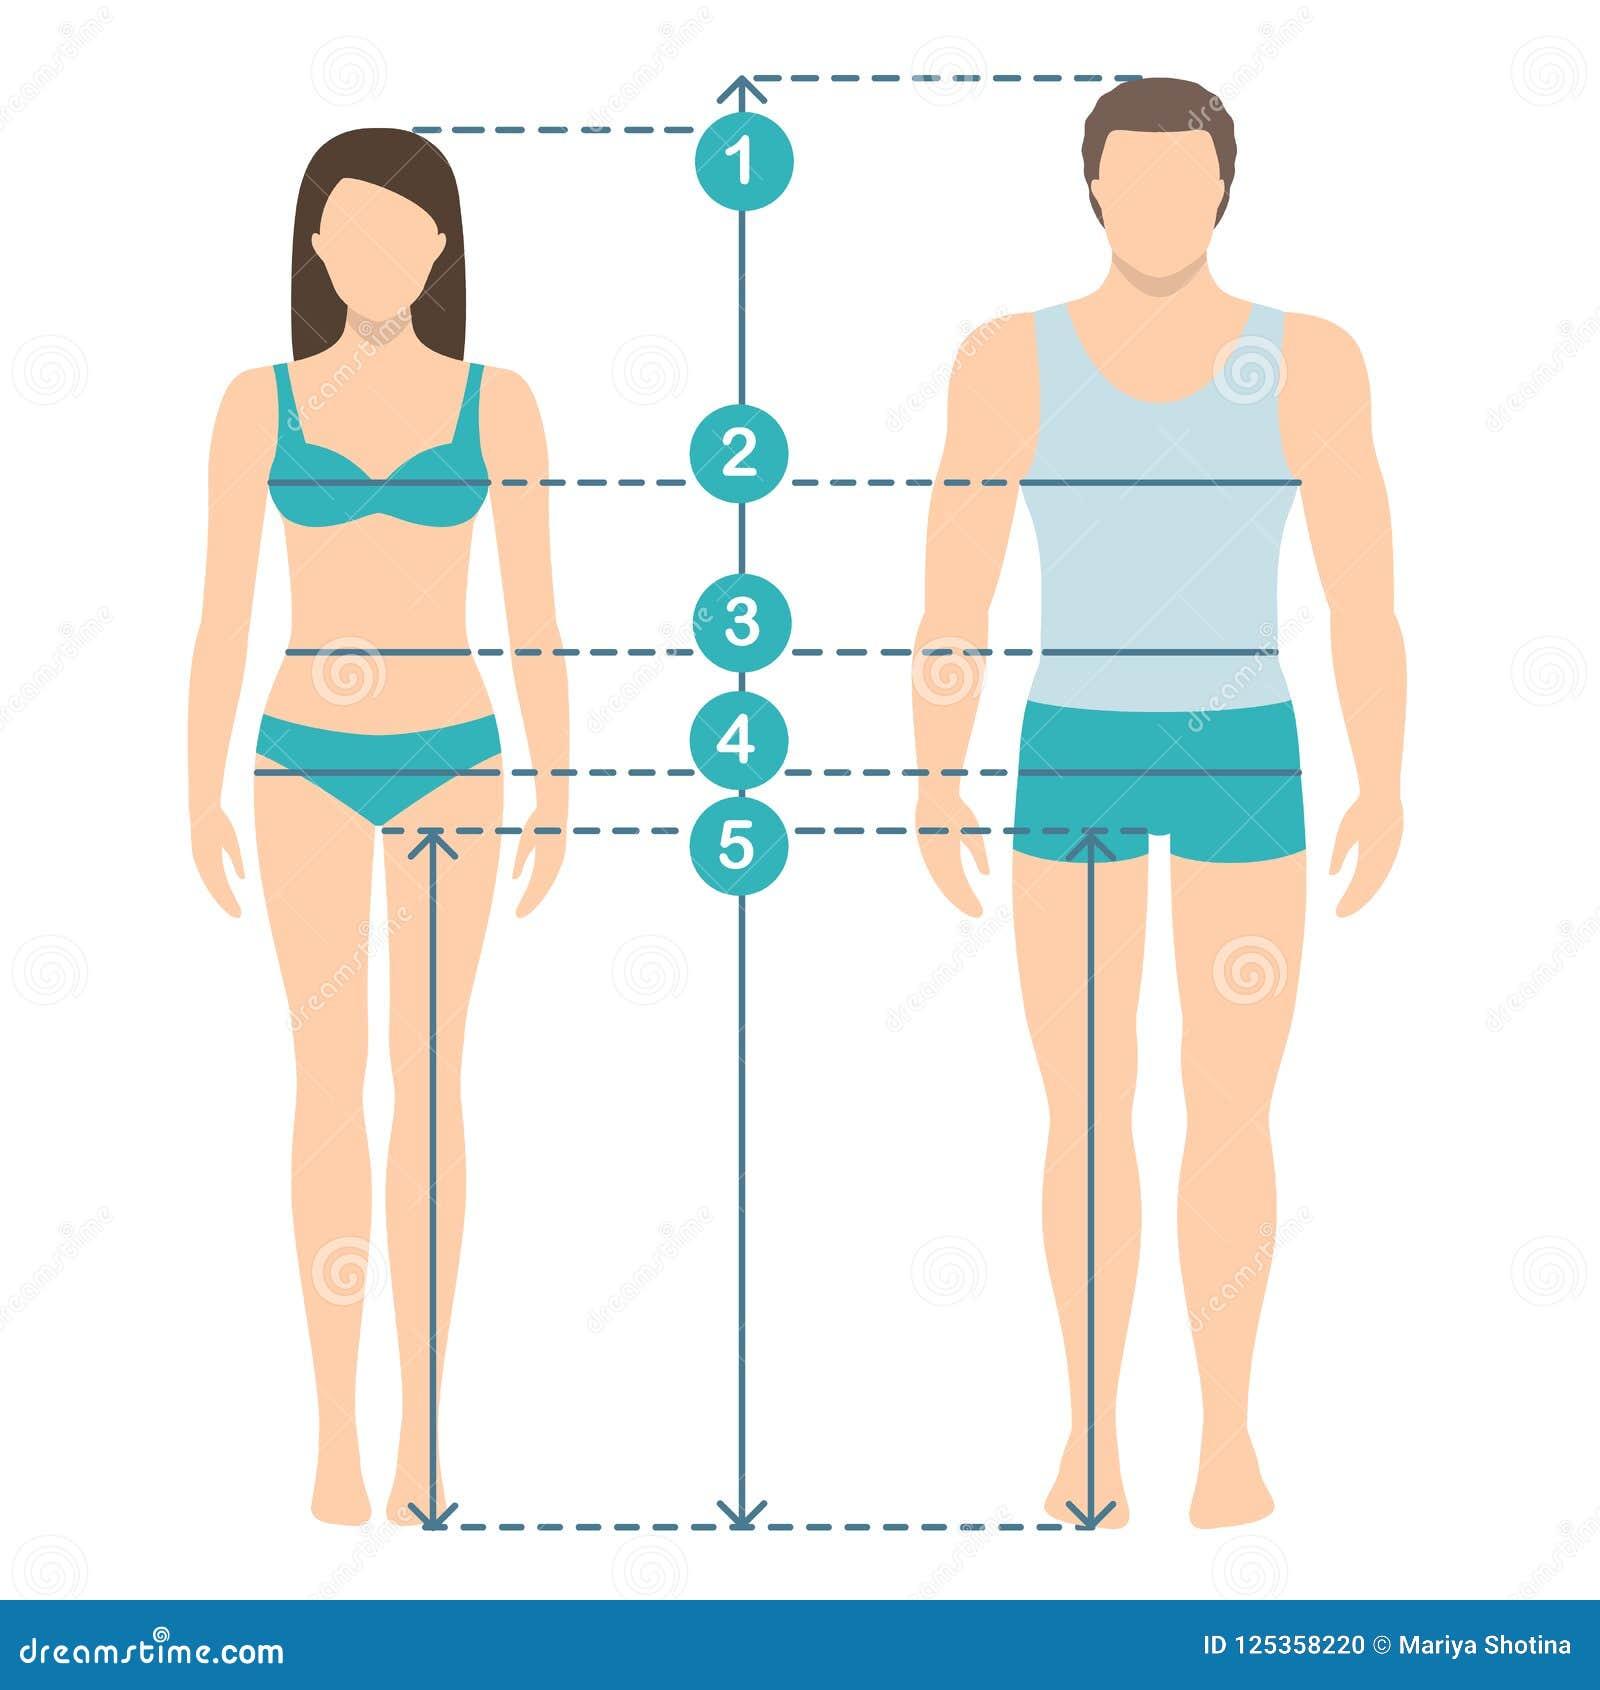 Man And Women Sizes Measurements  Human Body Measurements